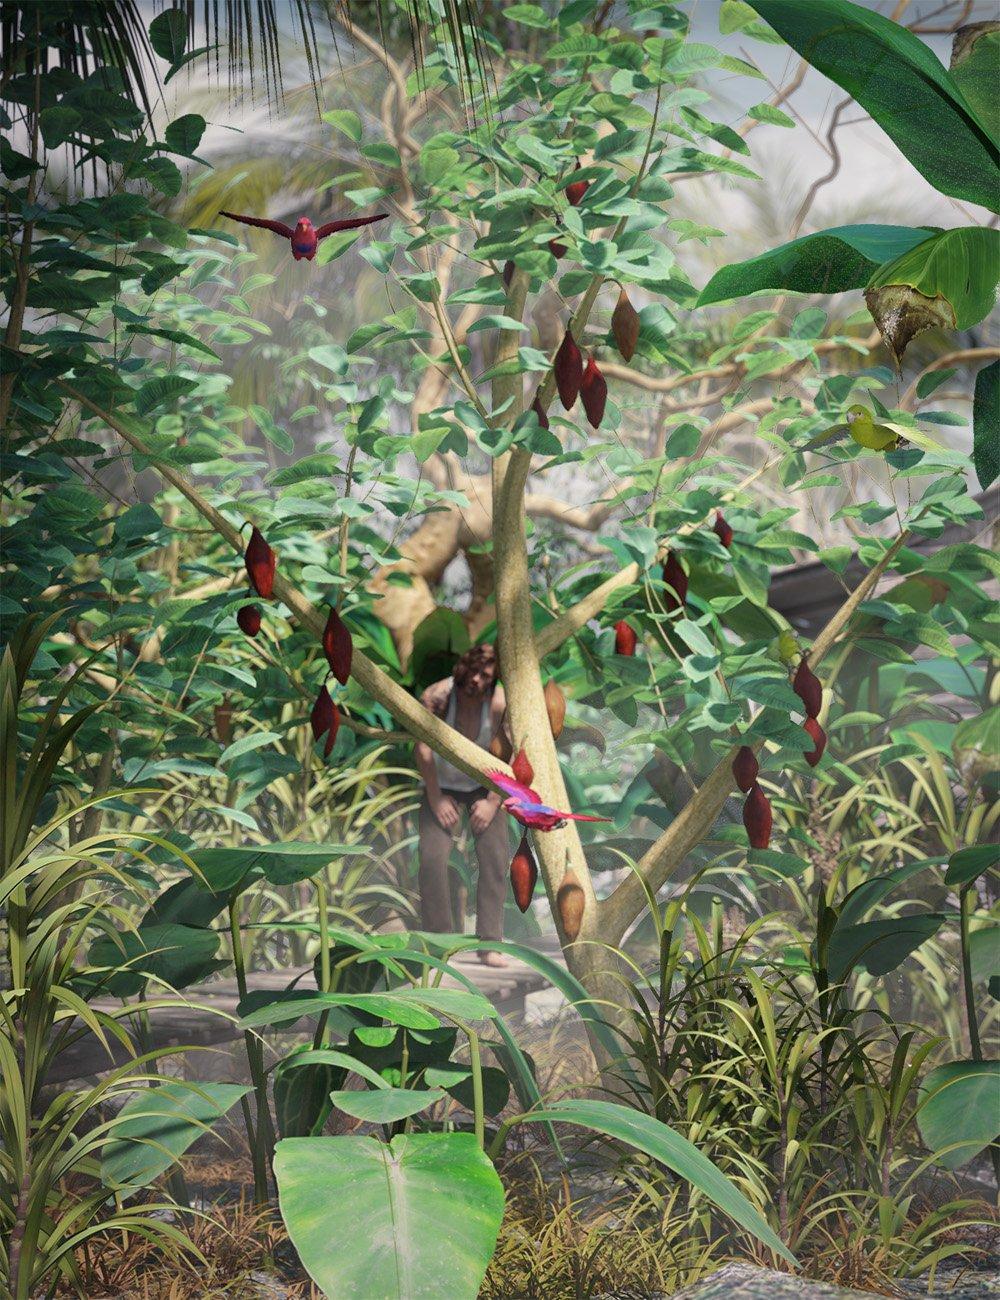 Tropical Plants - Edible Exotics by: MartinJFrost, 3D Models by Daz 3D